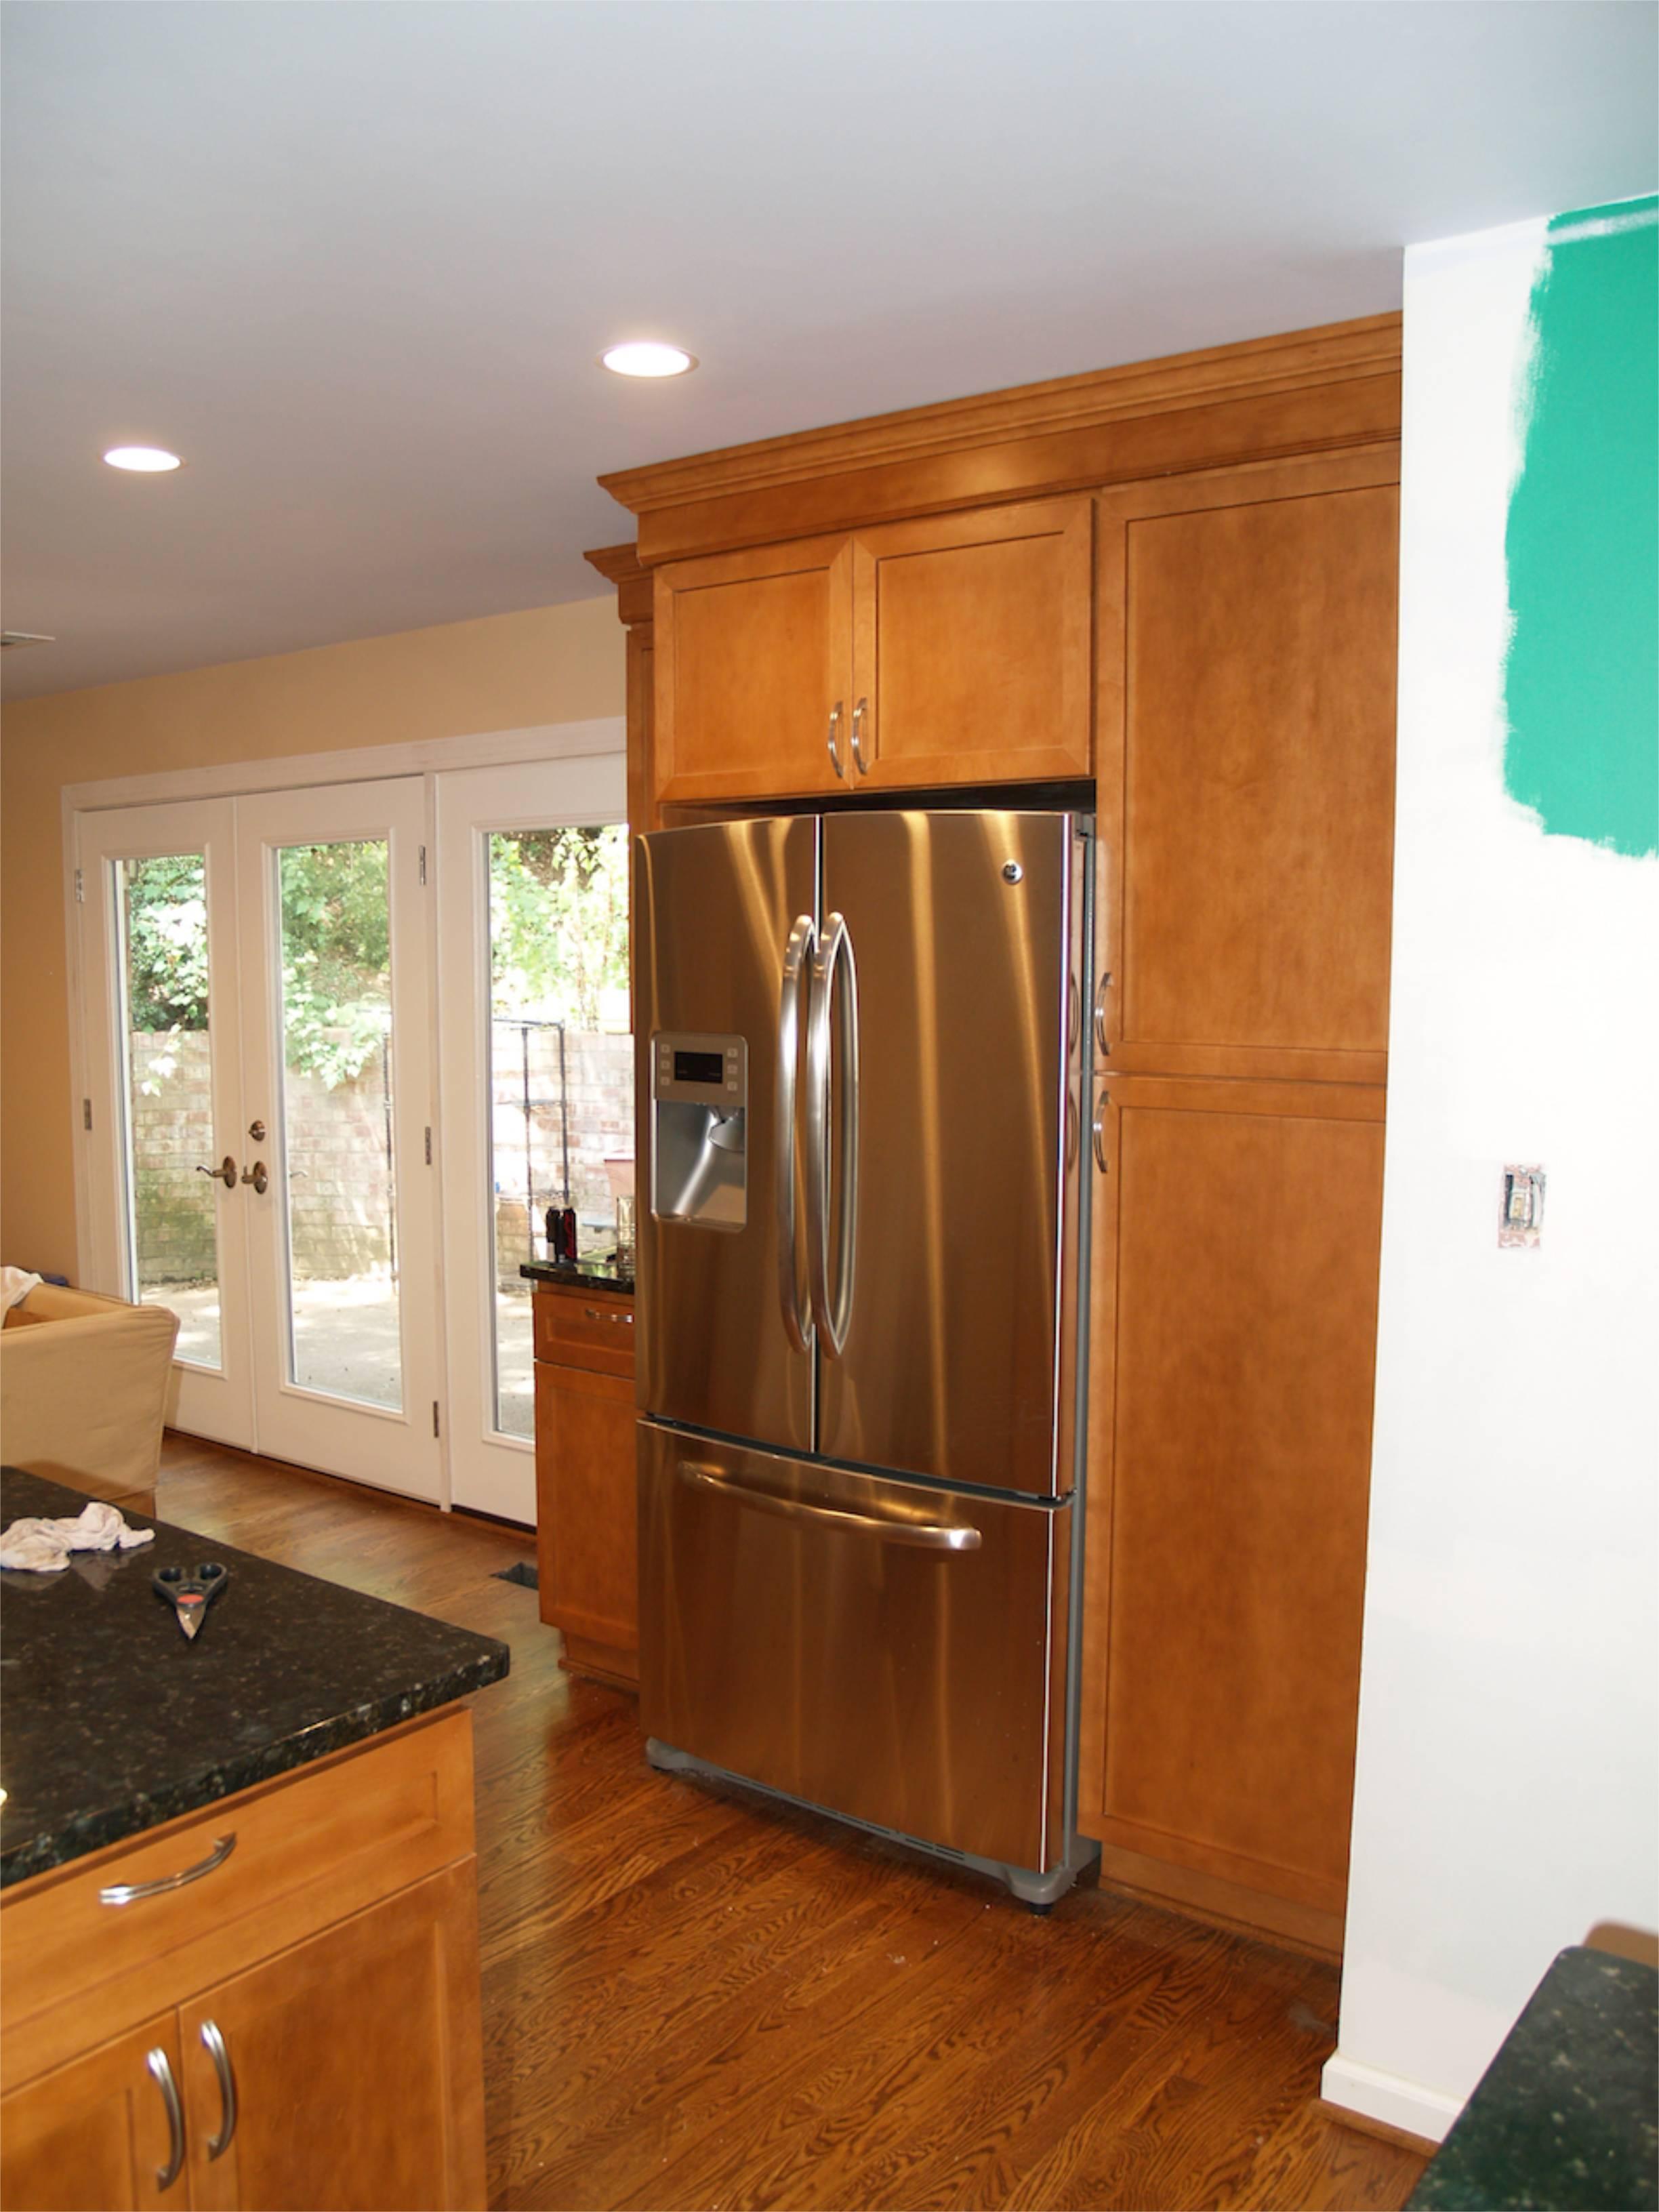 refrigerator area cabinets - Geeky Girl Engineer